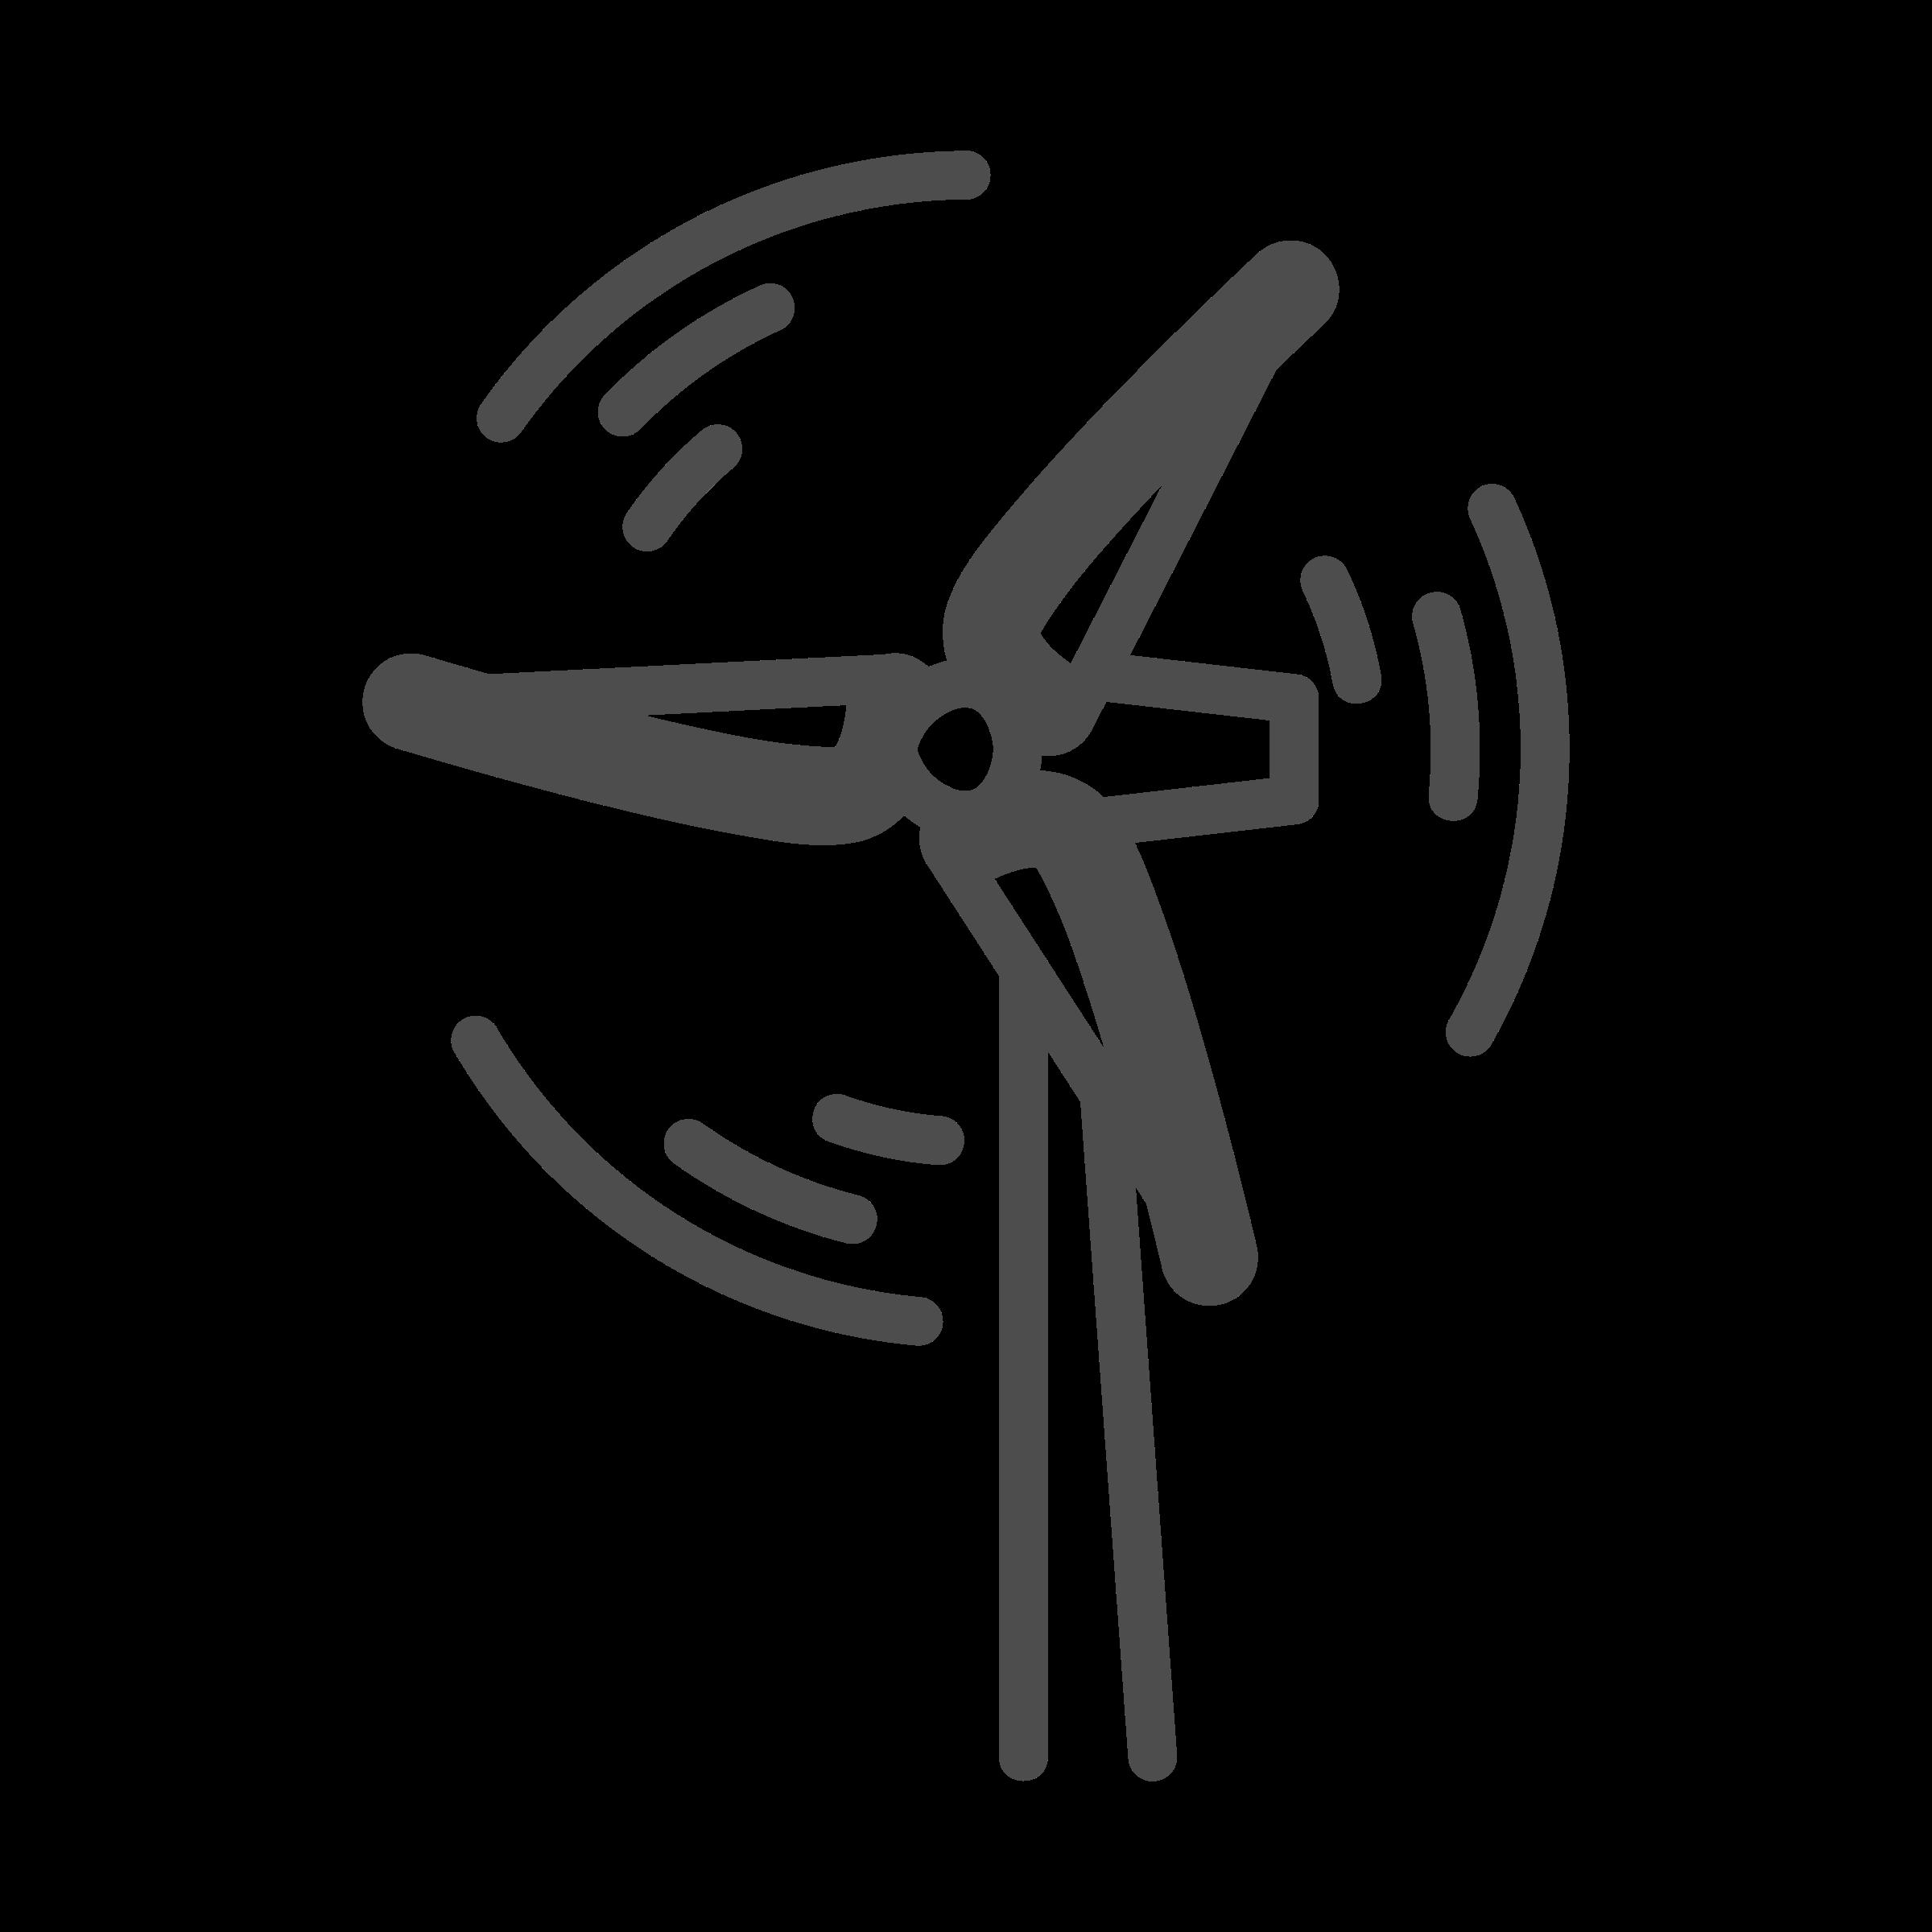 Energy Clipart Windpower Energy Windpower Transparent